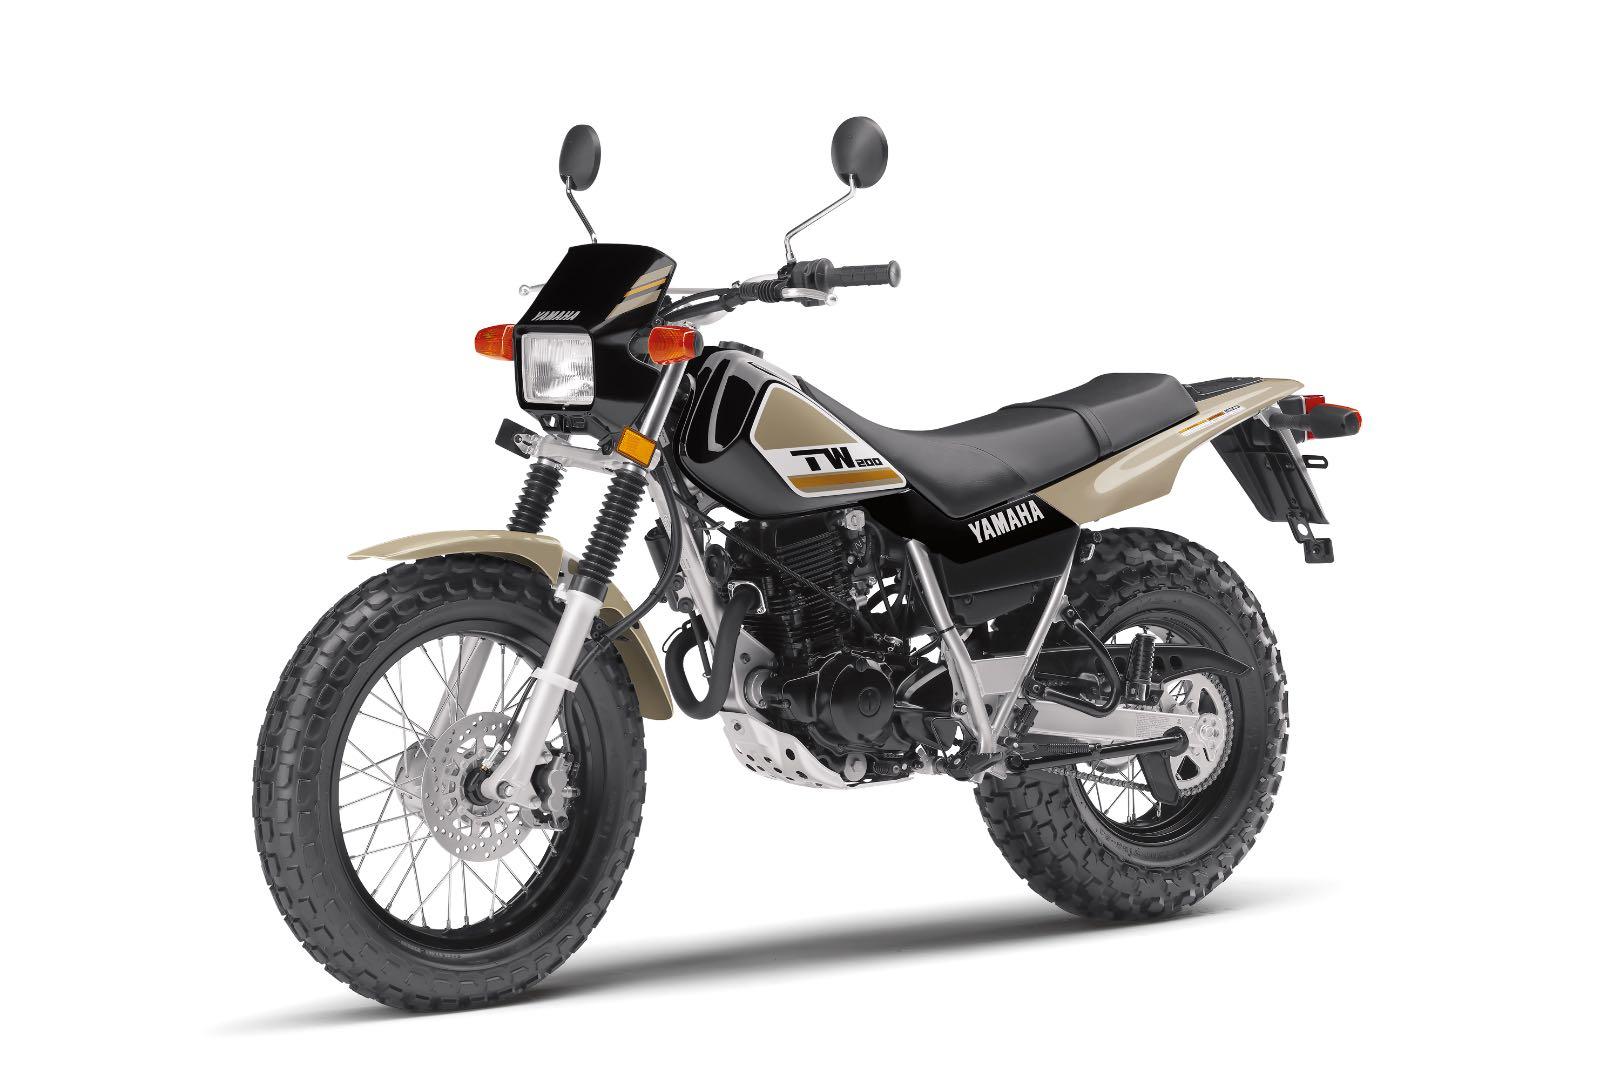 2018 Yamaha TW200 Specs